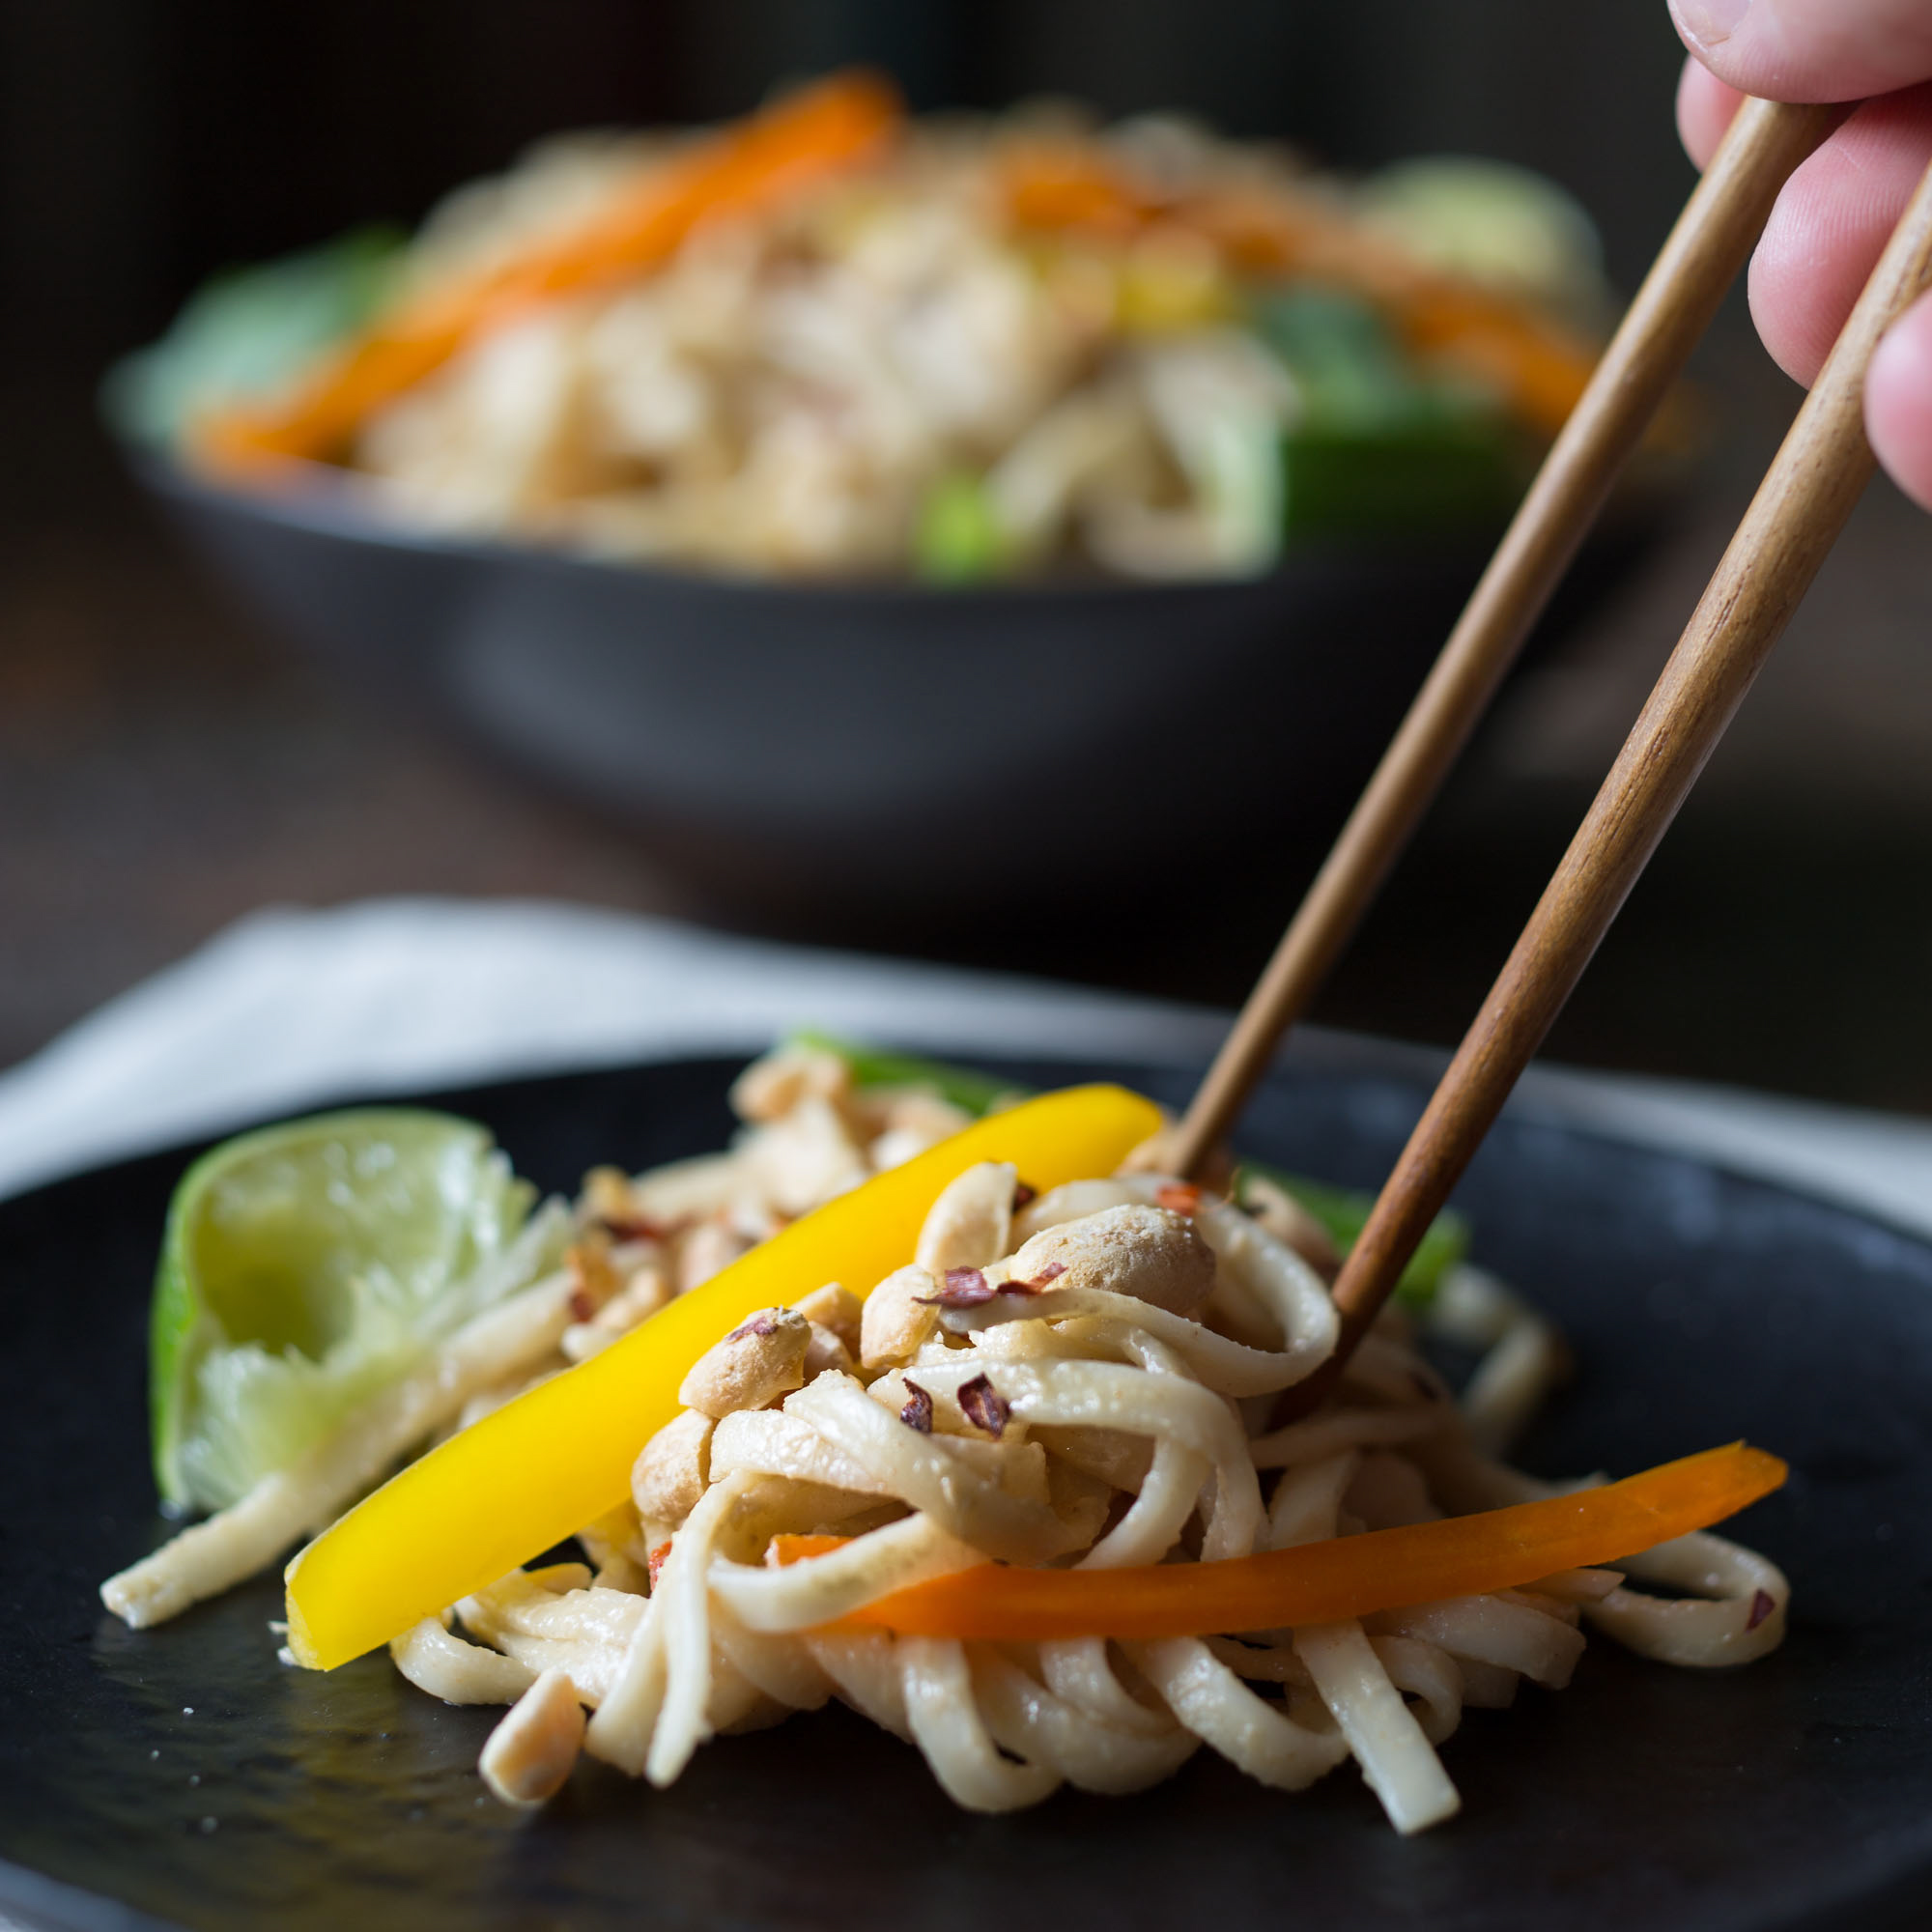 Portable Recipe: Cold Noodle Salad with Creamy Peanut Sauce | Kitchn